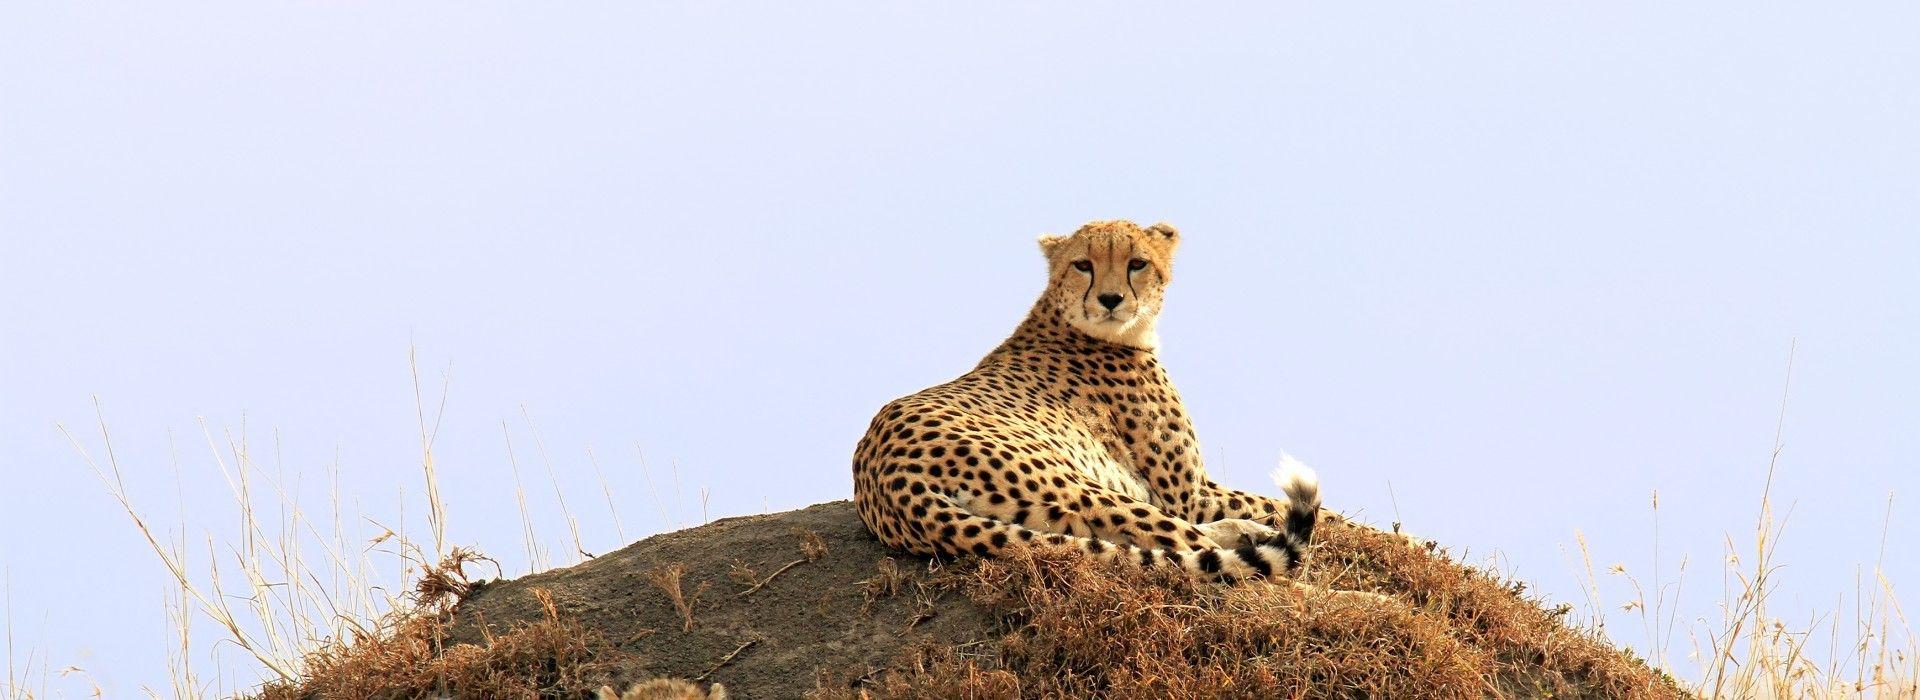 Explorer Tours in Nairobi